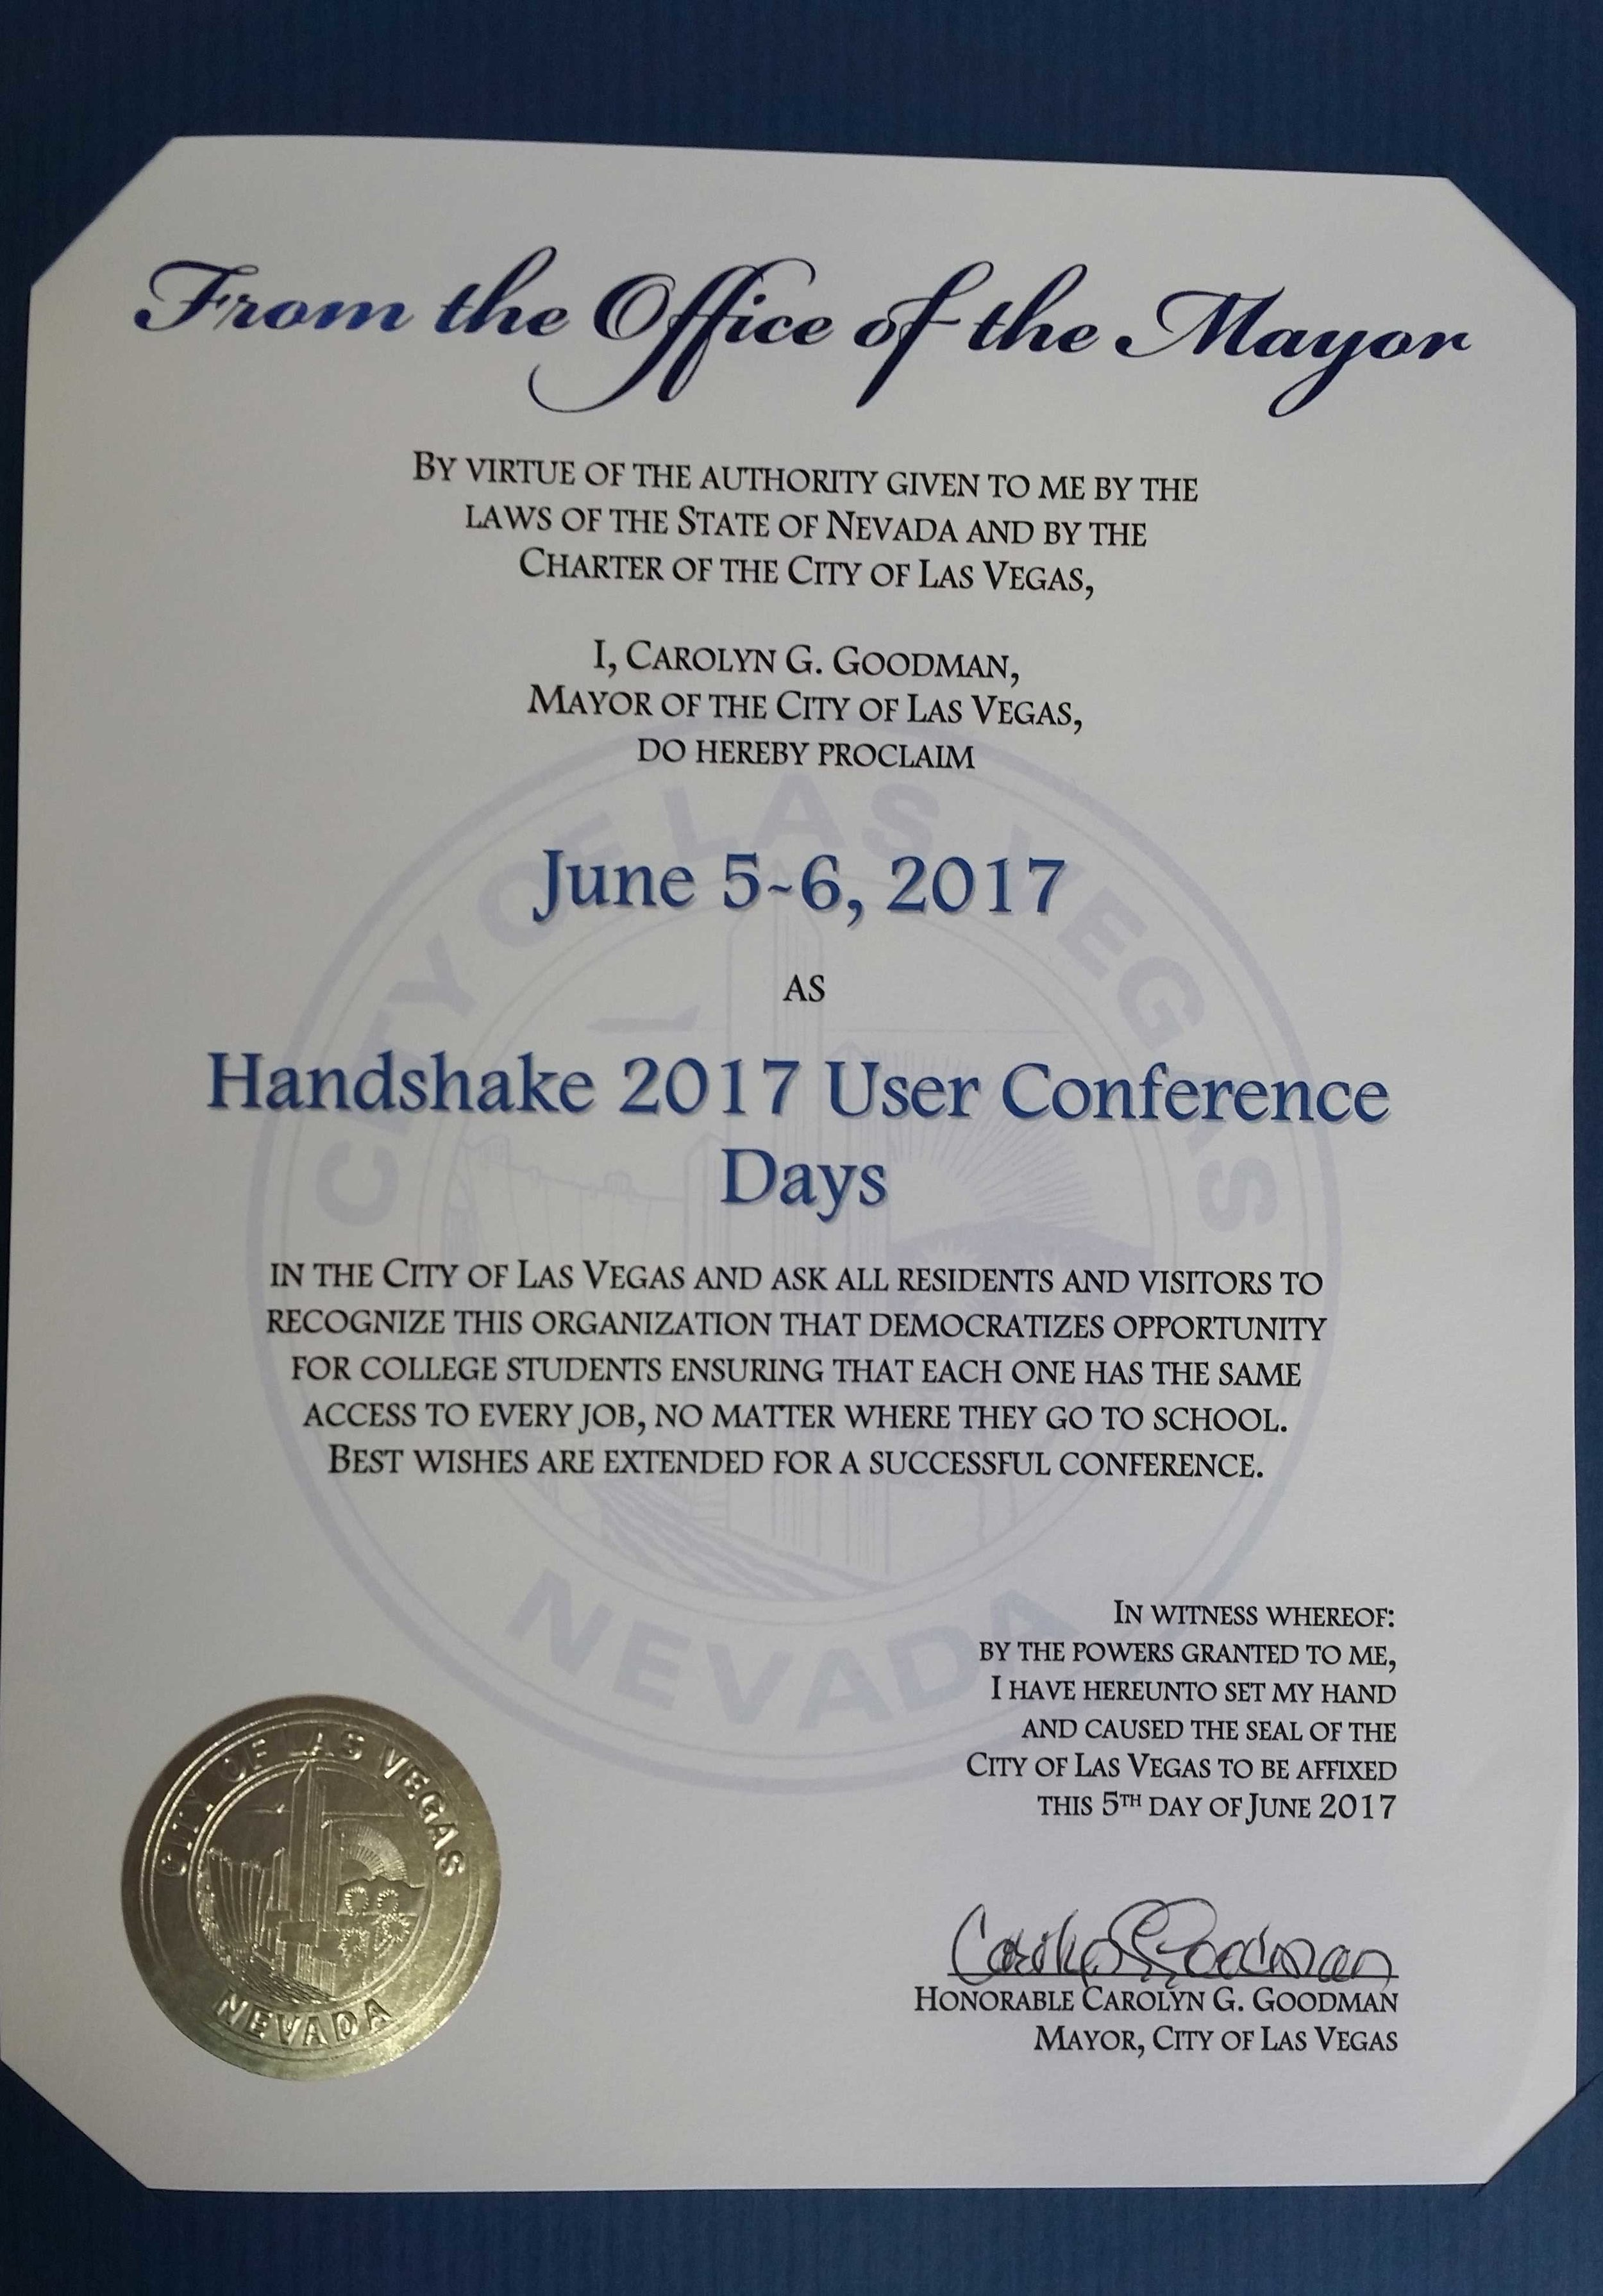 HUC2017-Proclamation.jpg